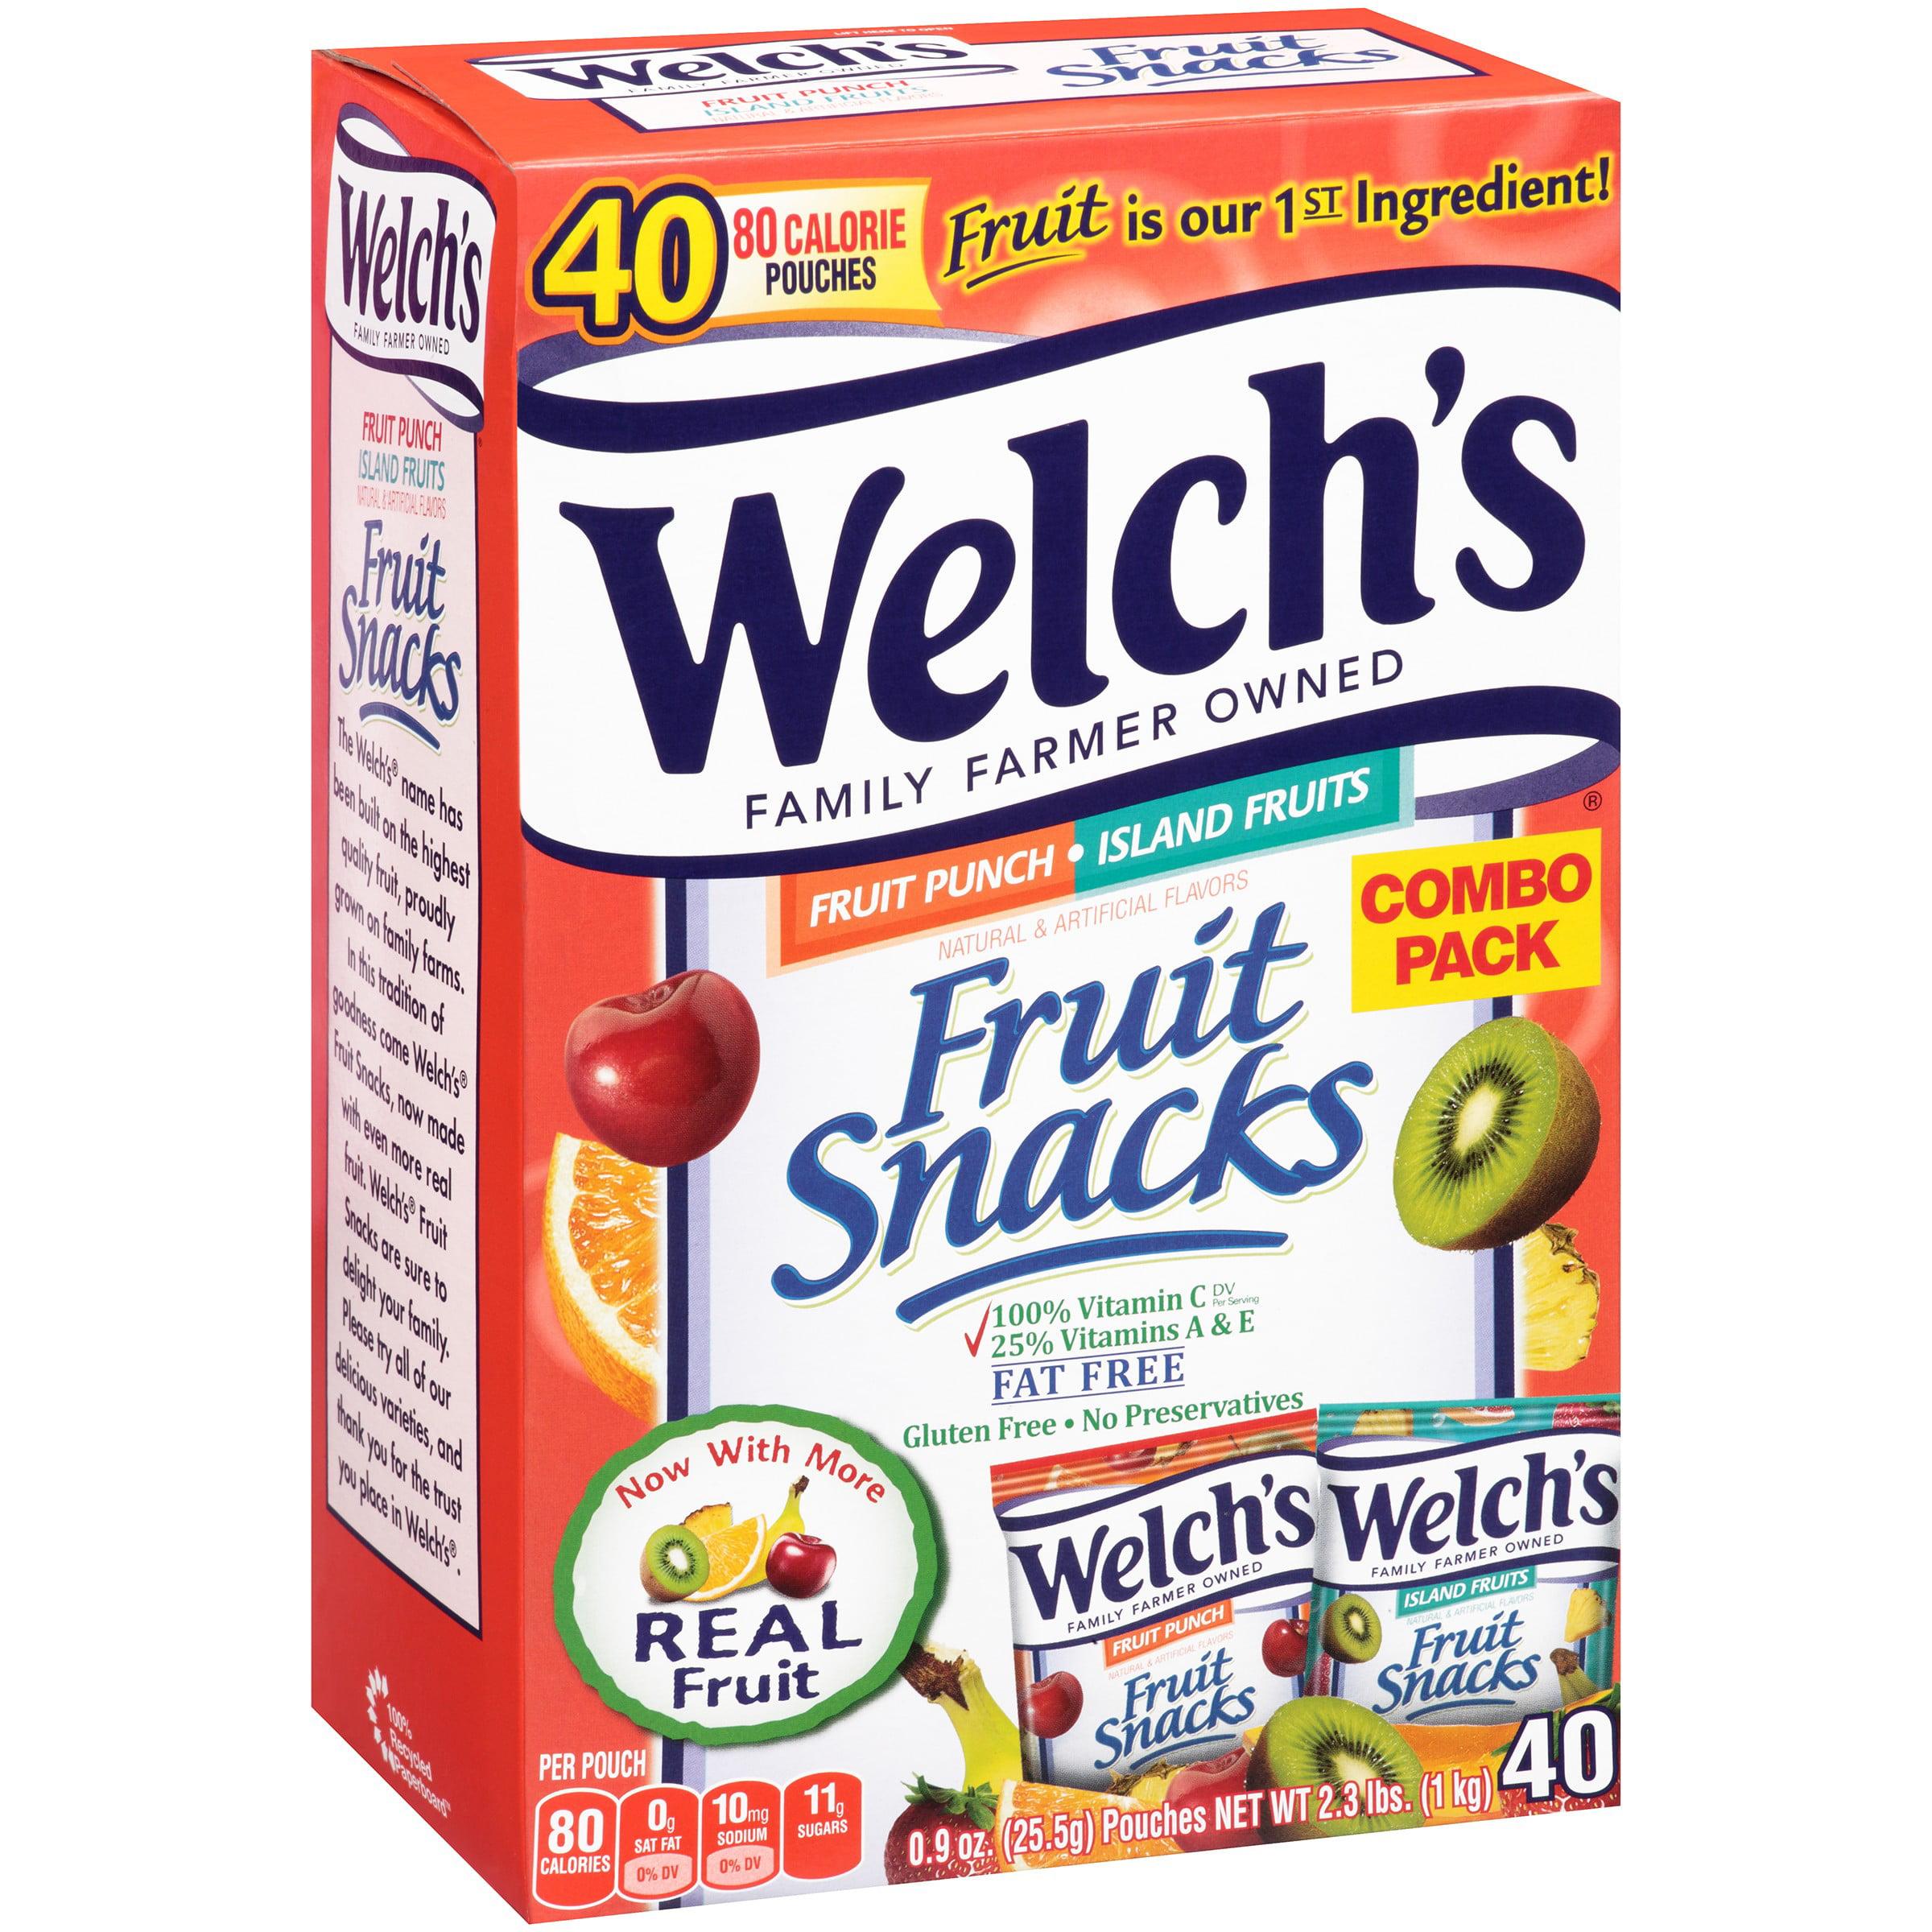 Welch's® Fruit Punch/Island Fruits Fruit Snacks 40-0.9 oz. Box